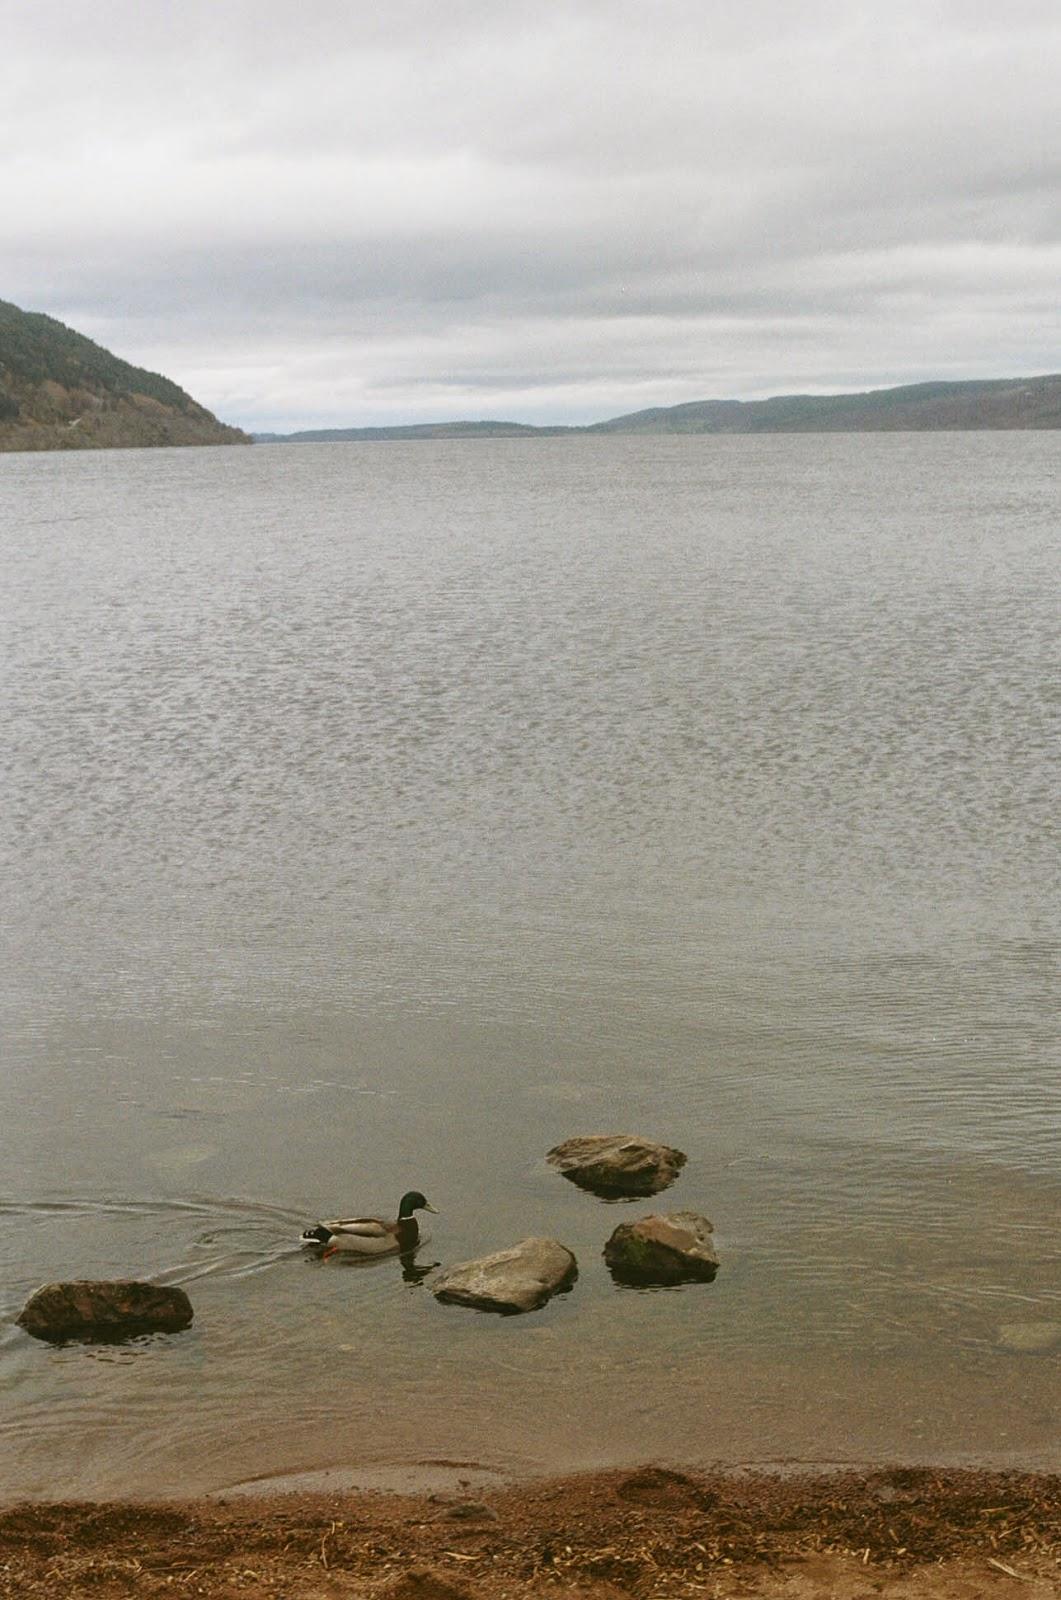 Loch Ness Urquhart Castle Scottish Highlands